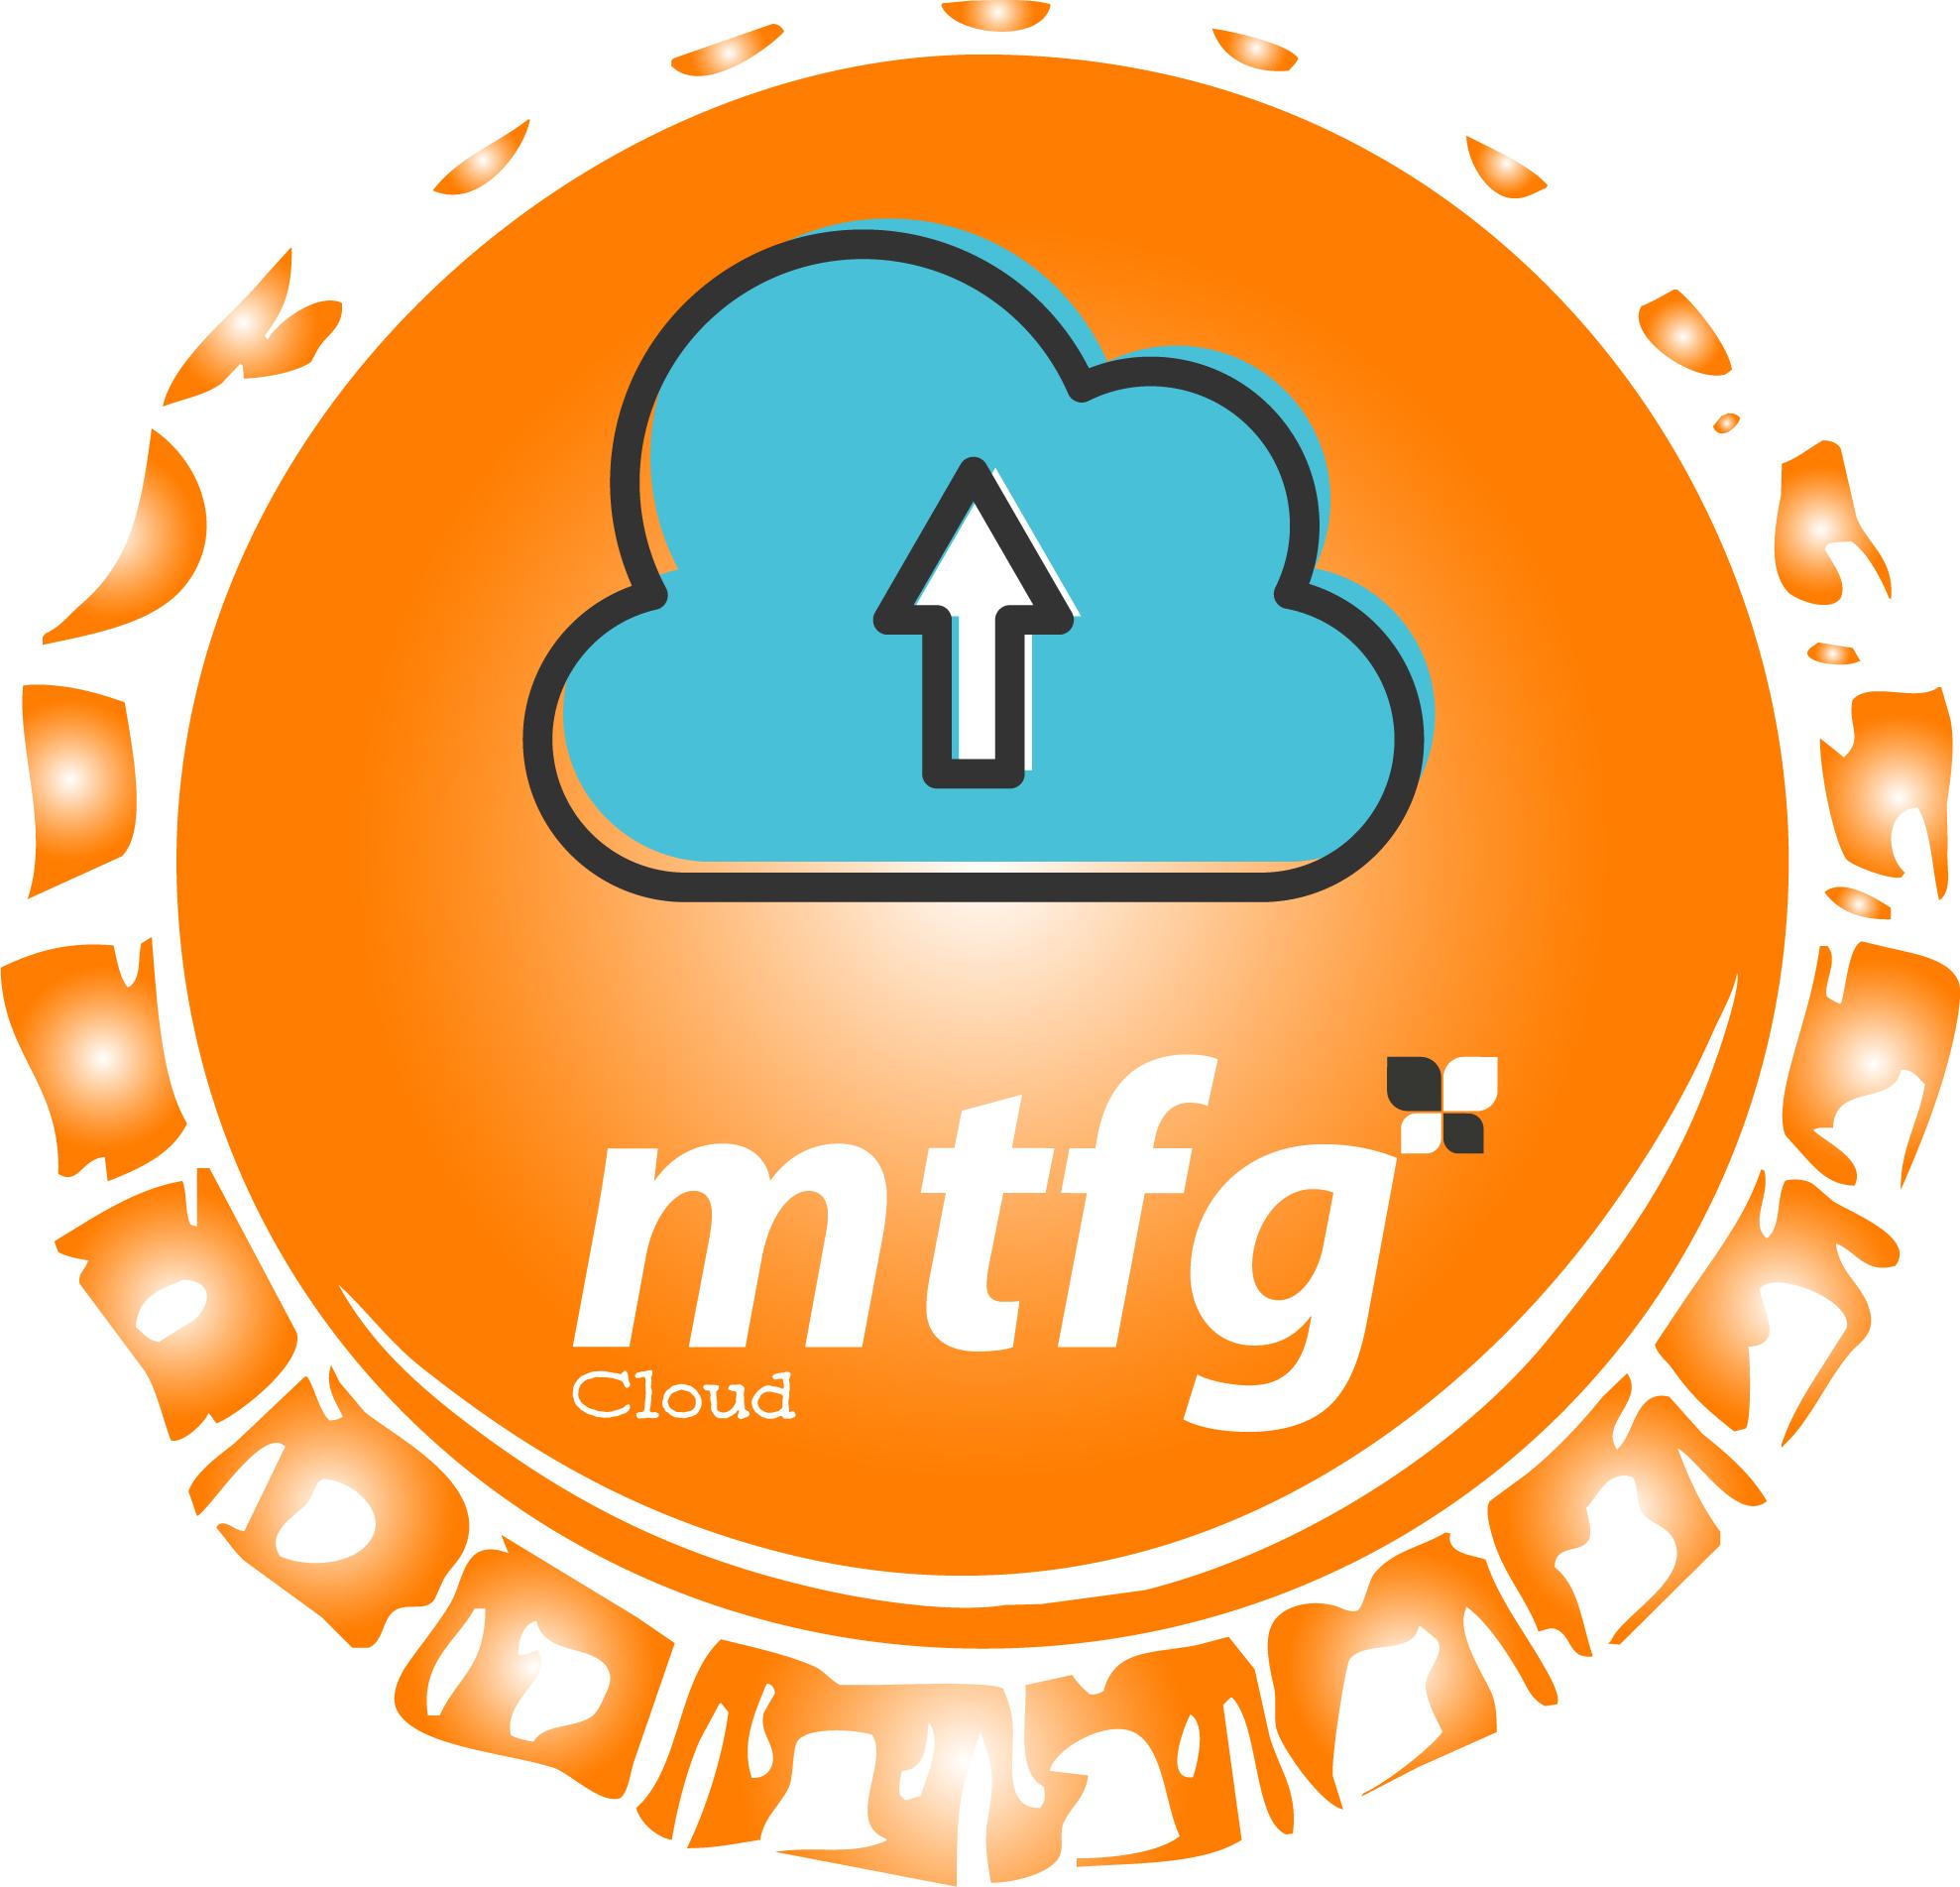 MTFG Cloud